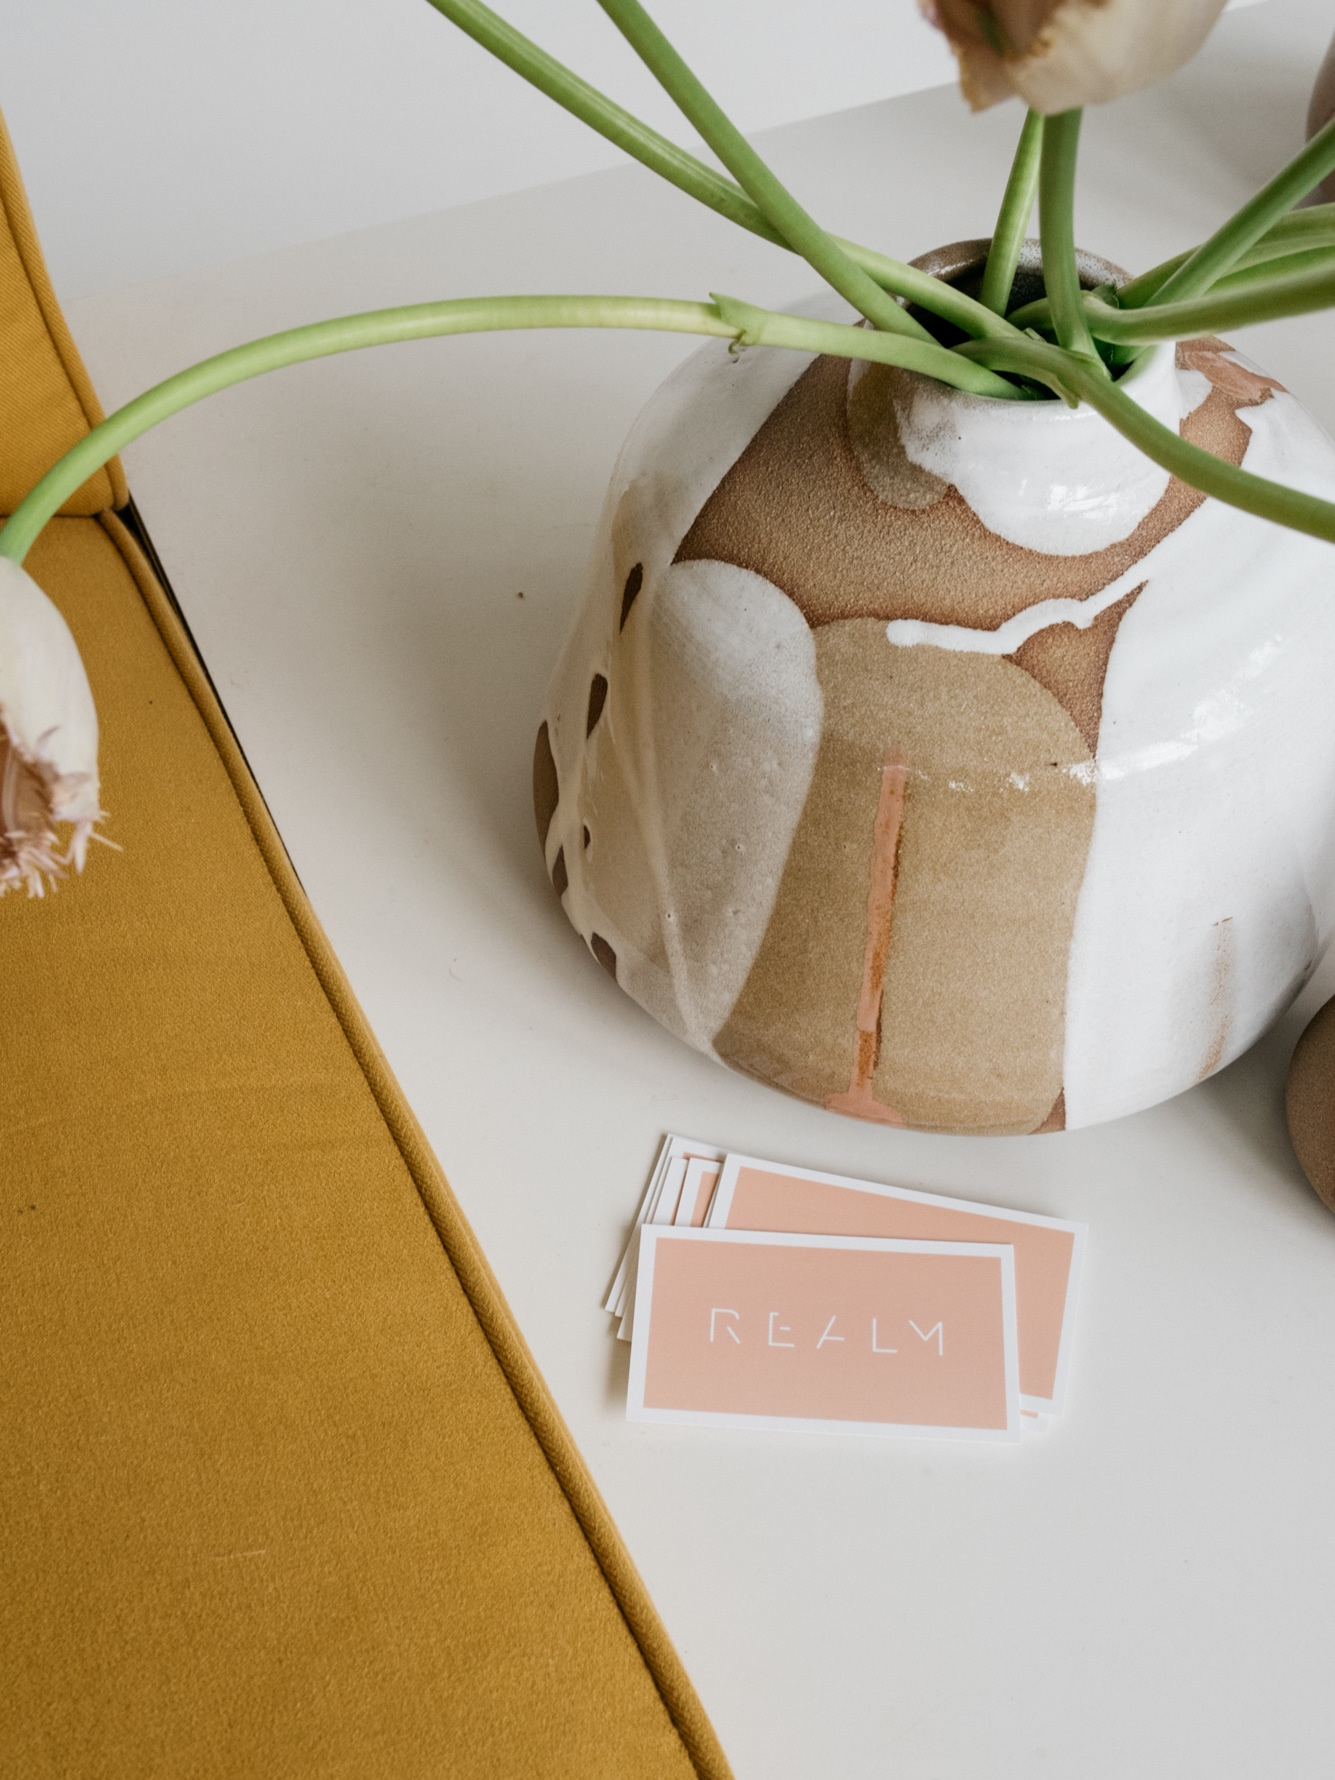 Ceramics by  Mortar & Stone